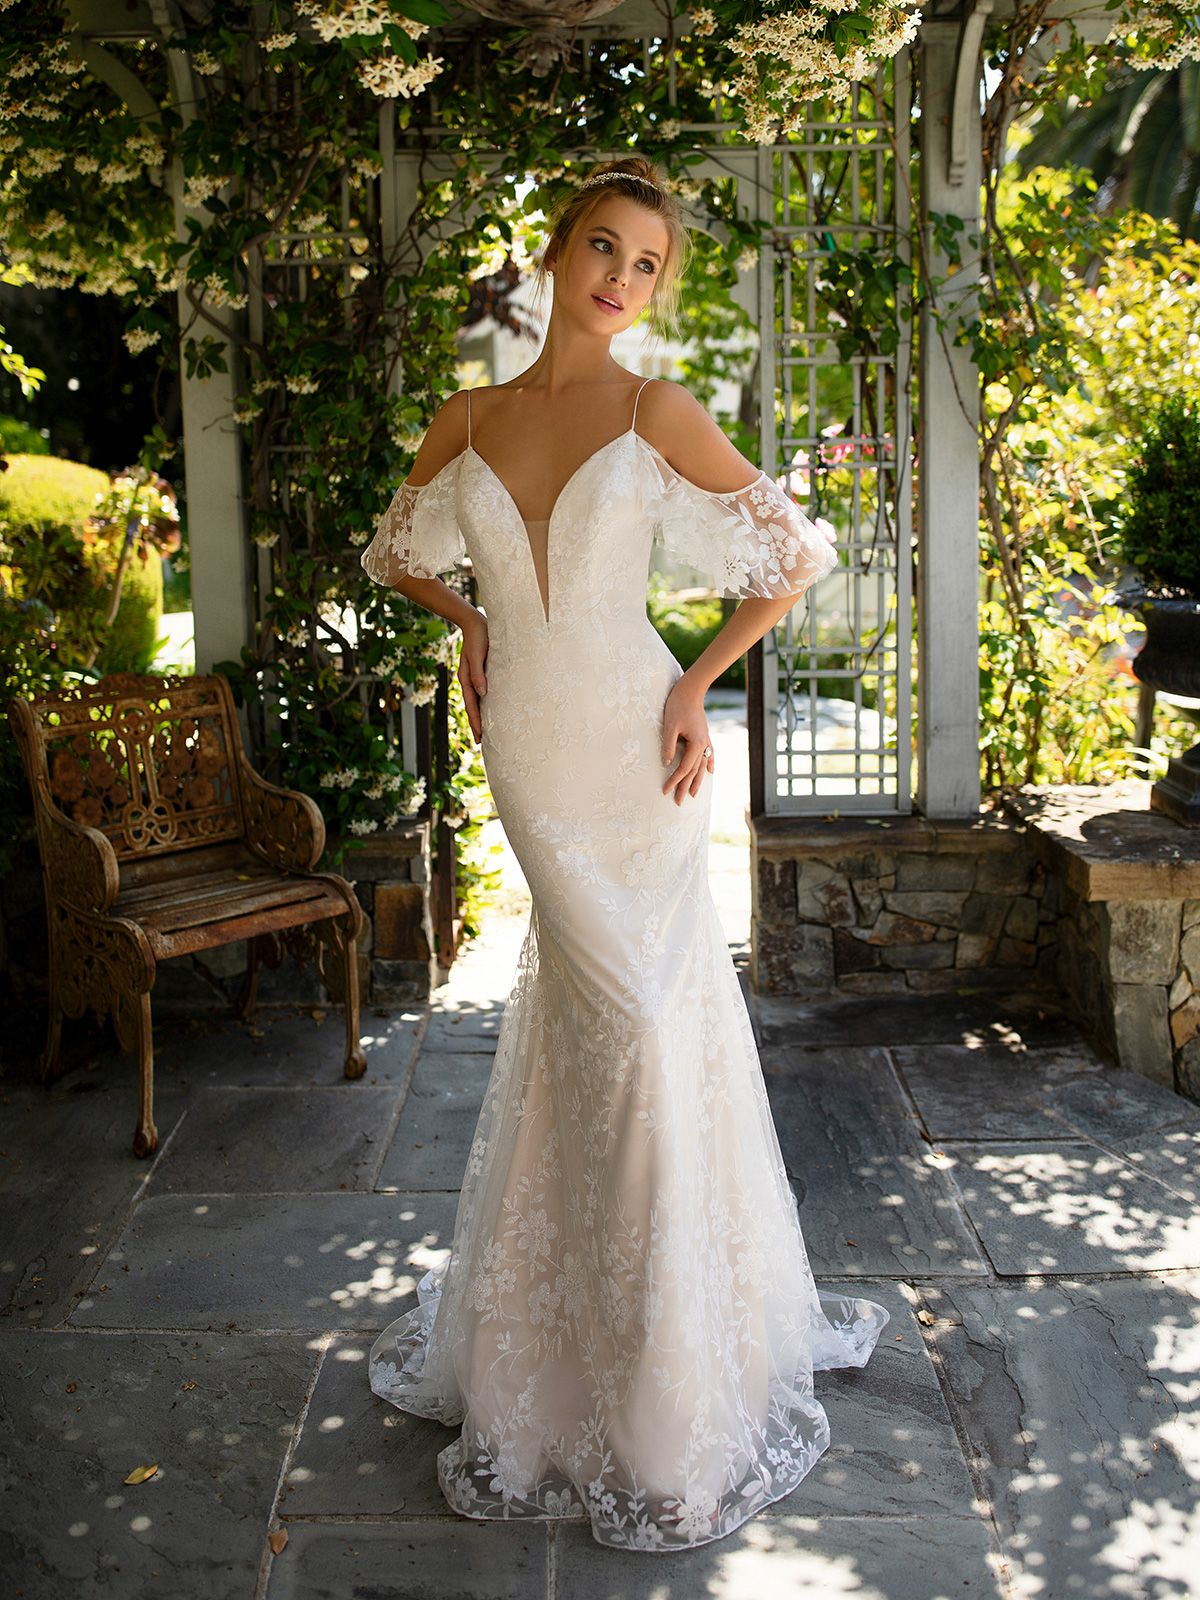 Sparkly Floral Mermaid Wedding Gown Simply Val Stefani Annetta S2141 Wedding Dresses Sydney Wedding Gowns Mermaid Bridal Gowns [ 1600 x 1200 Pixel ]